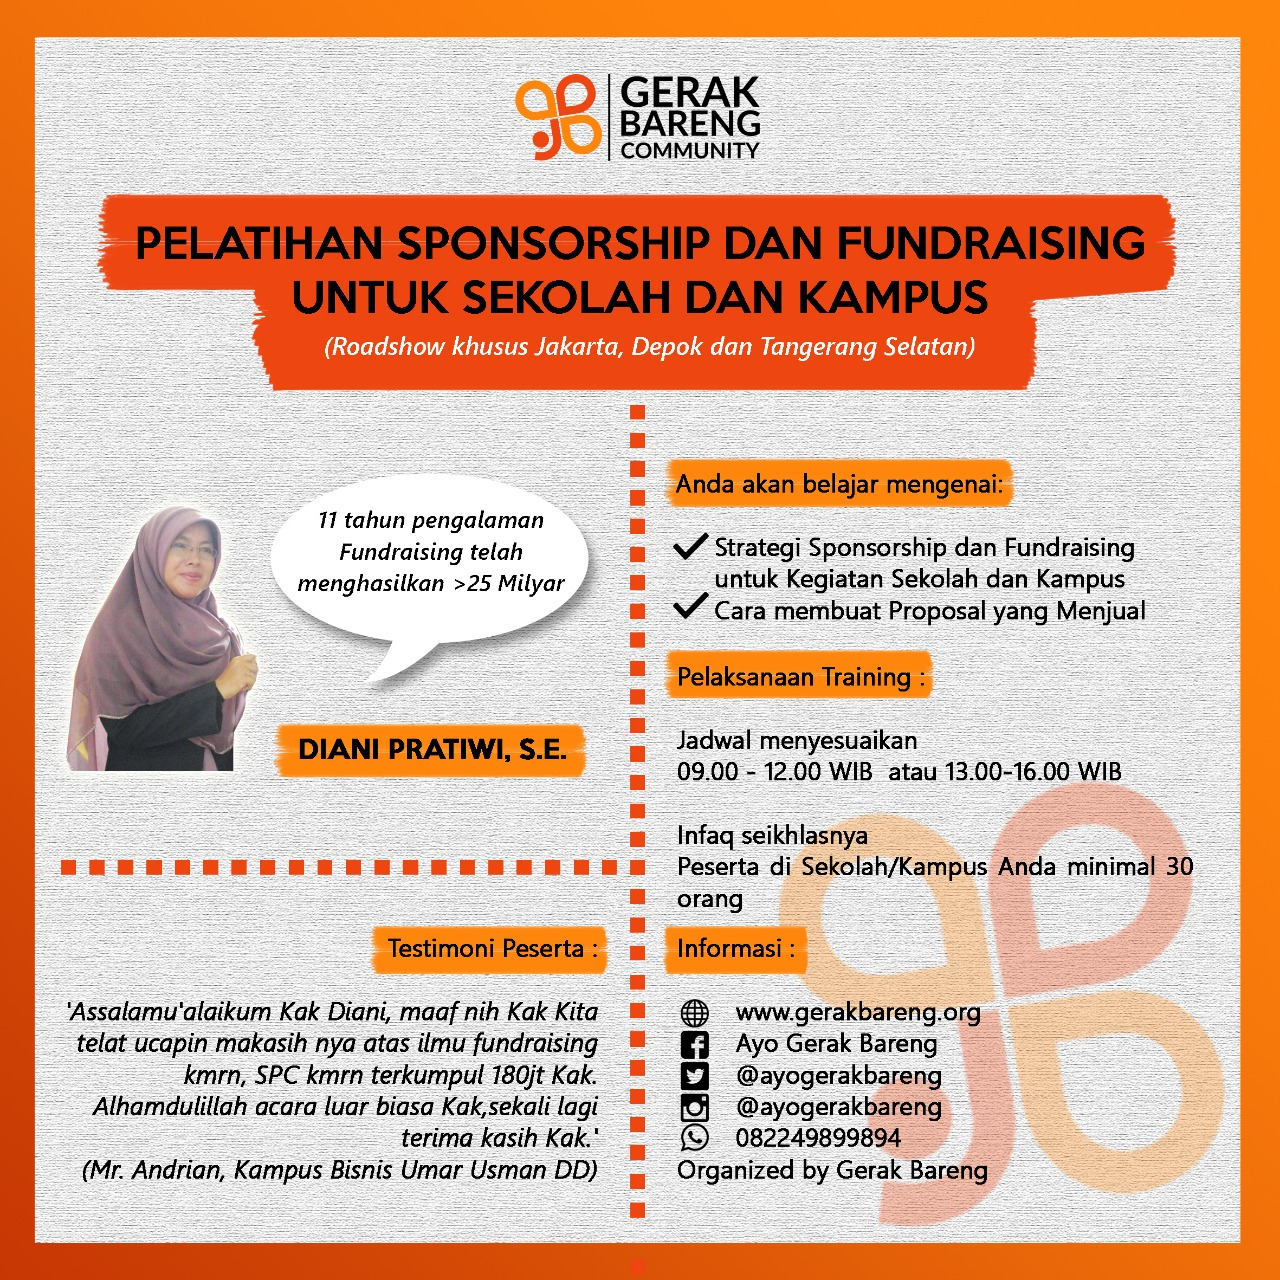 Pelatihan Sponsorship Dan Fundraising